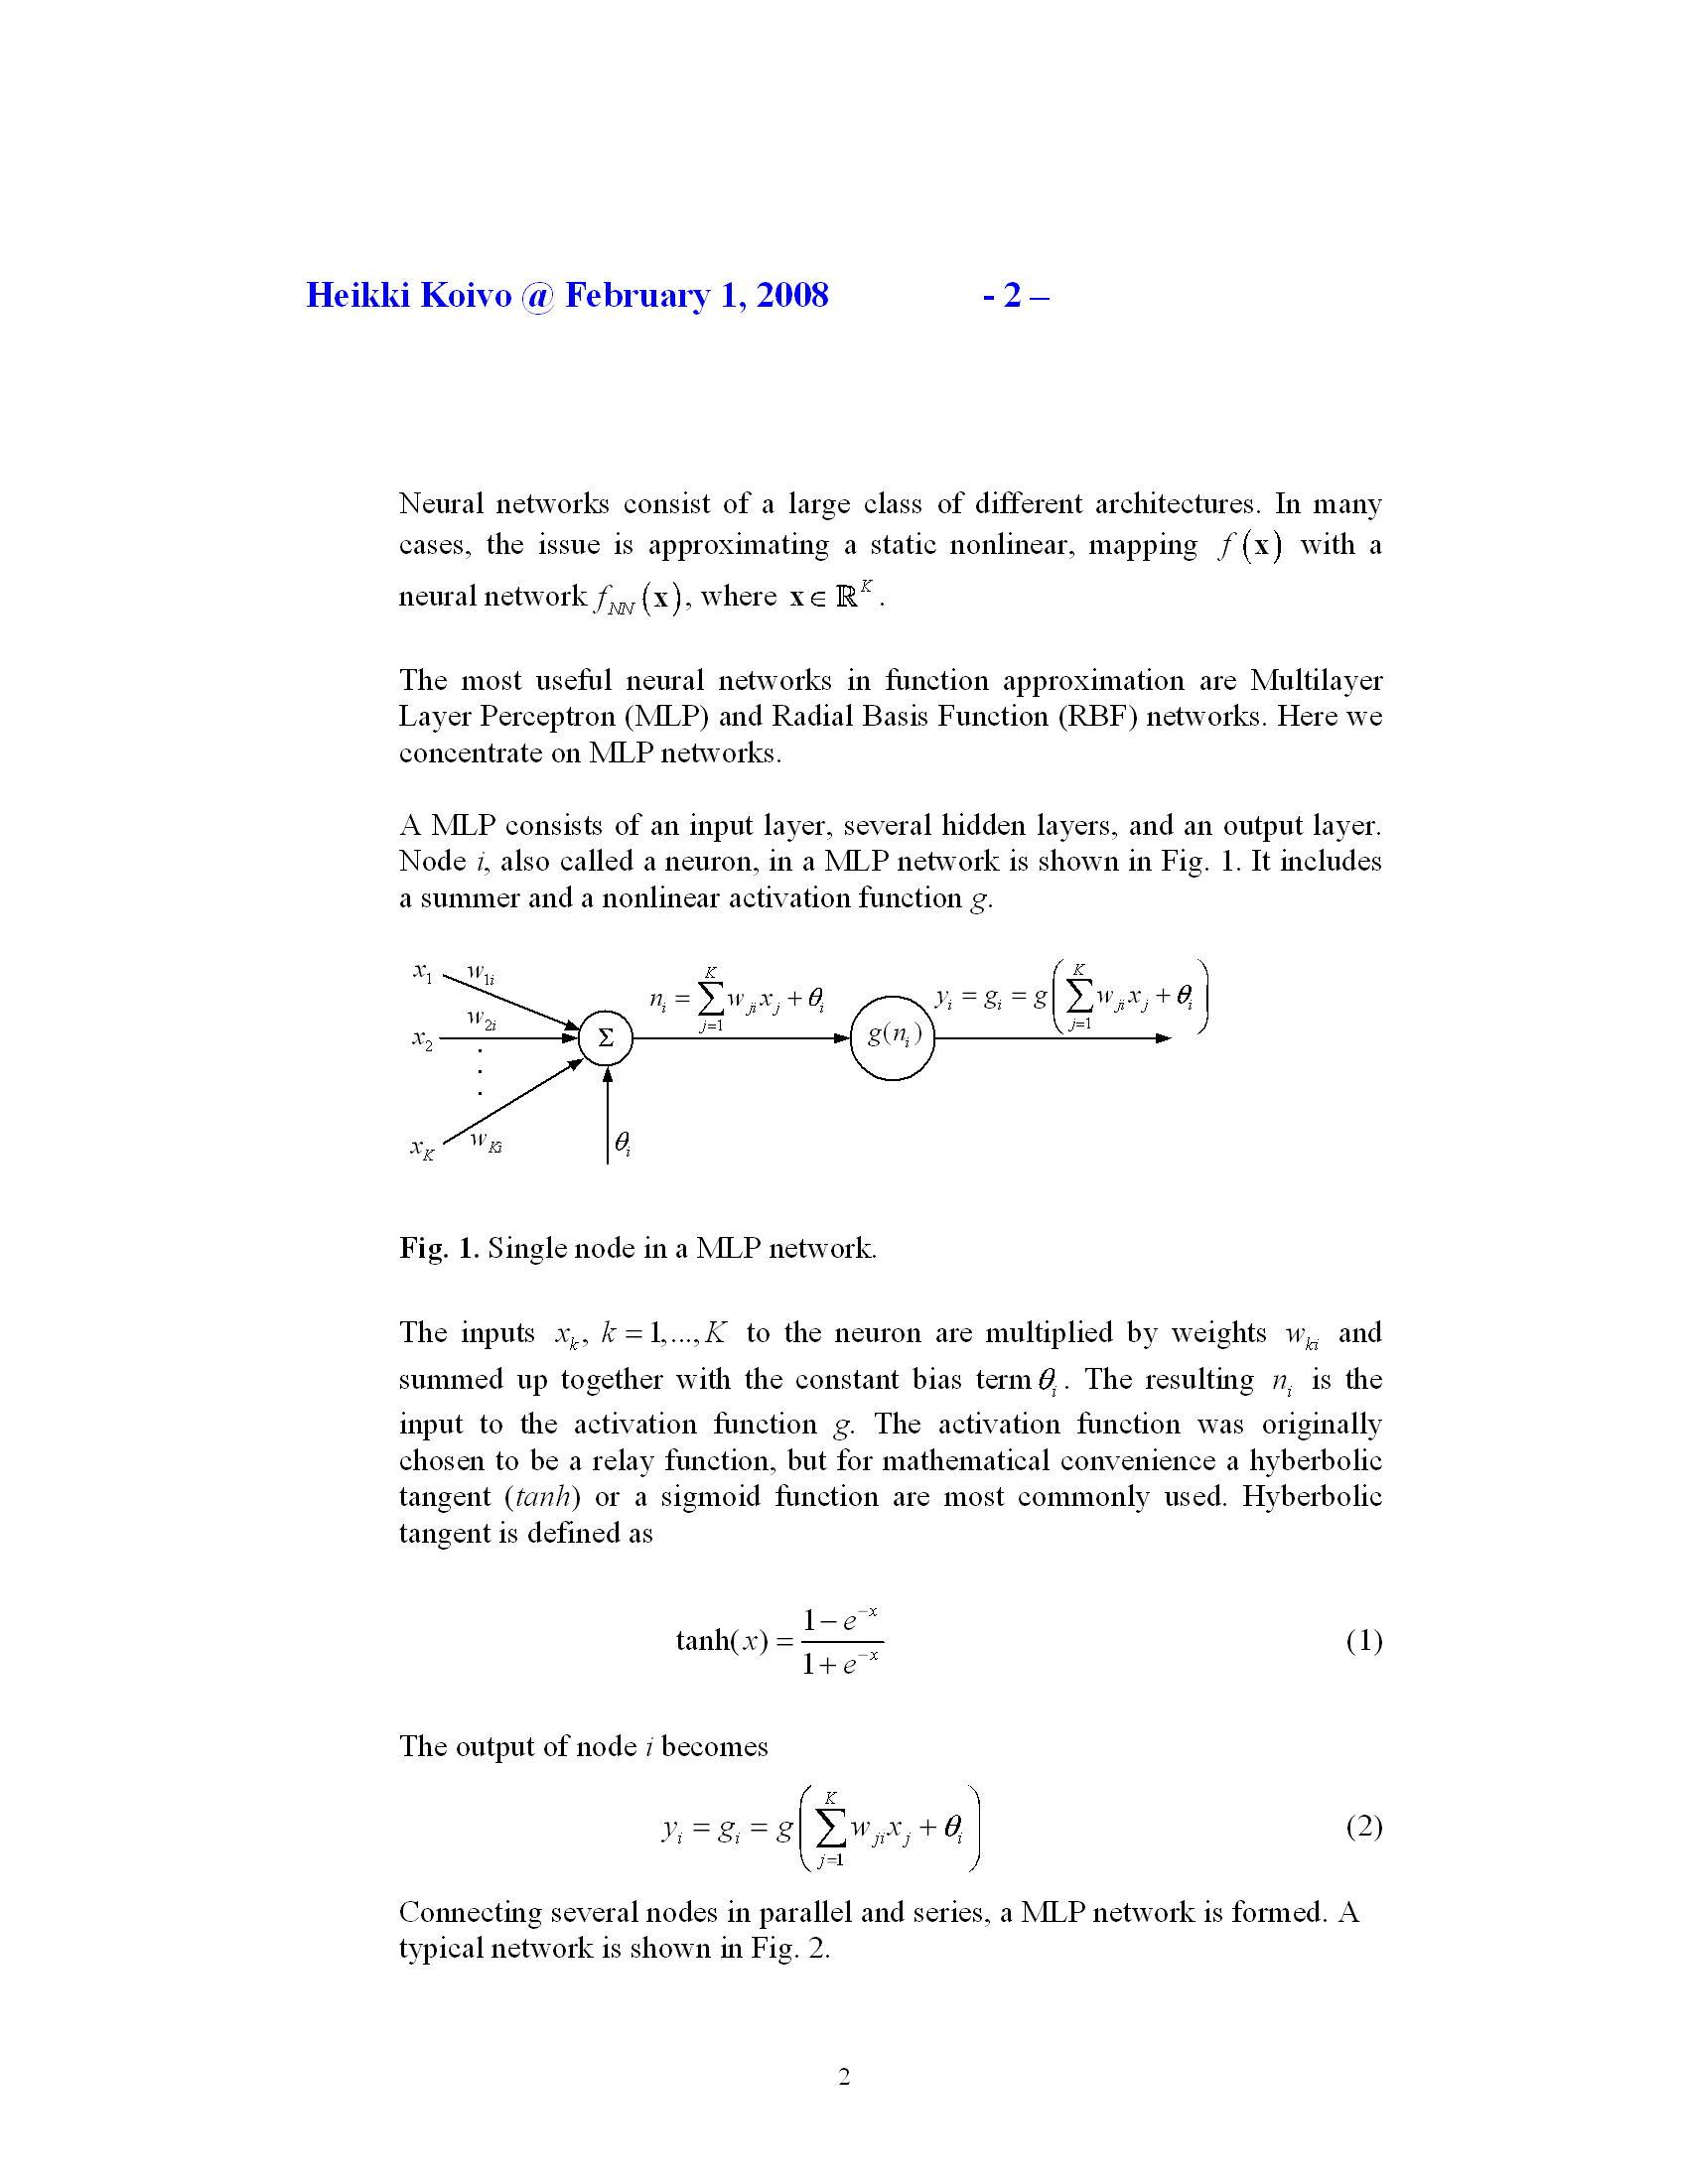 NEURAL NETWORKS - Basics using MATLAB - Neural Network Toolbox 28